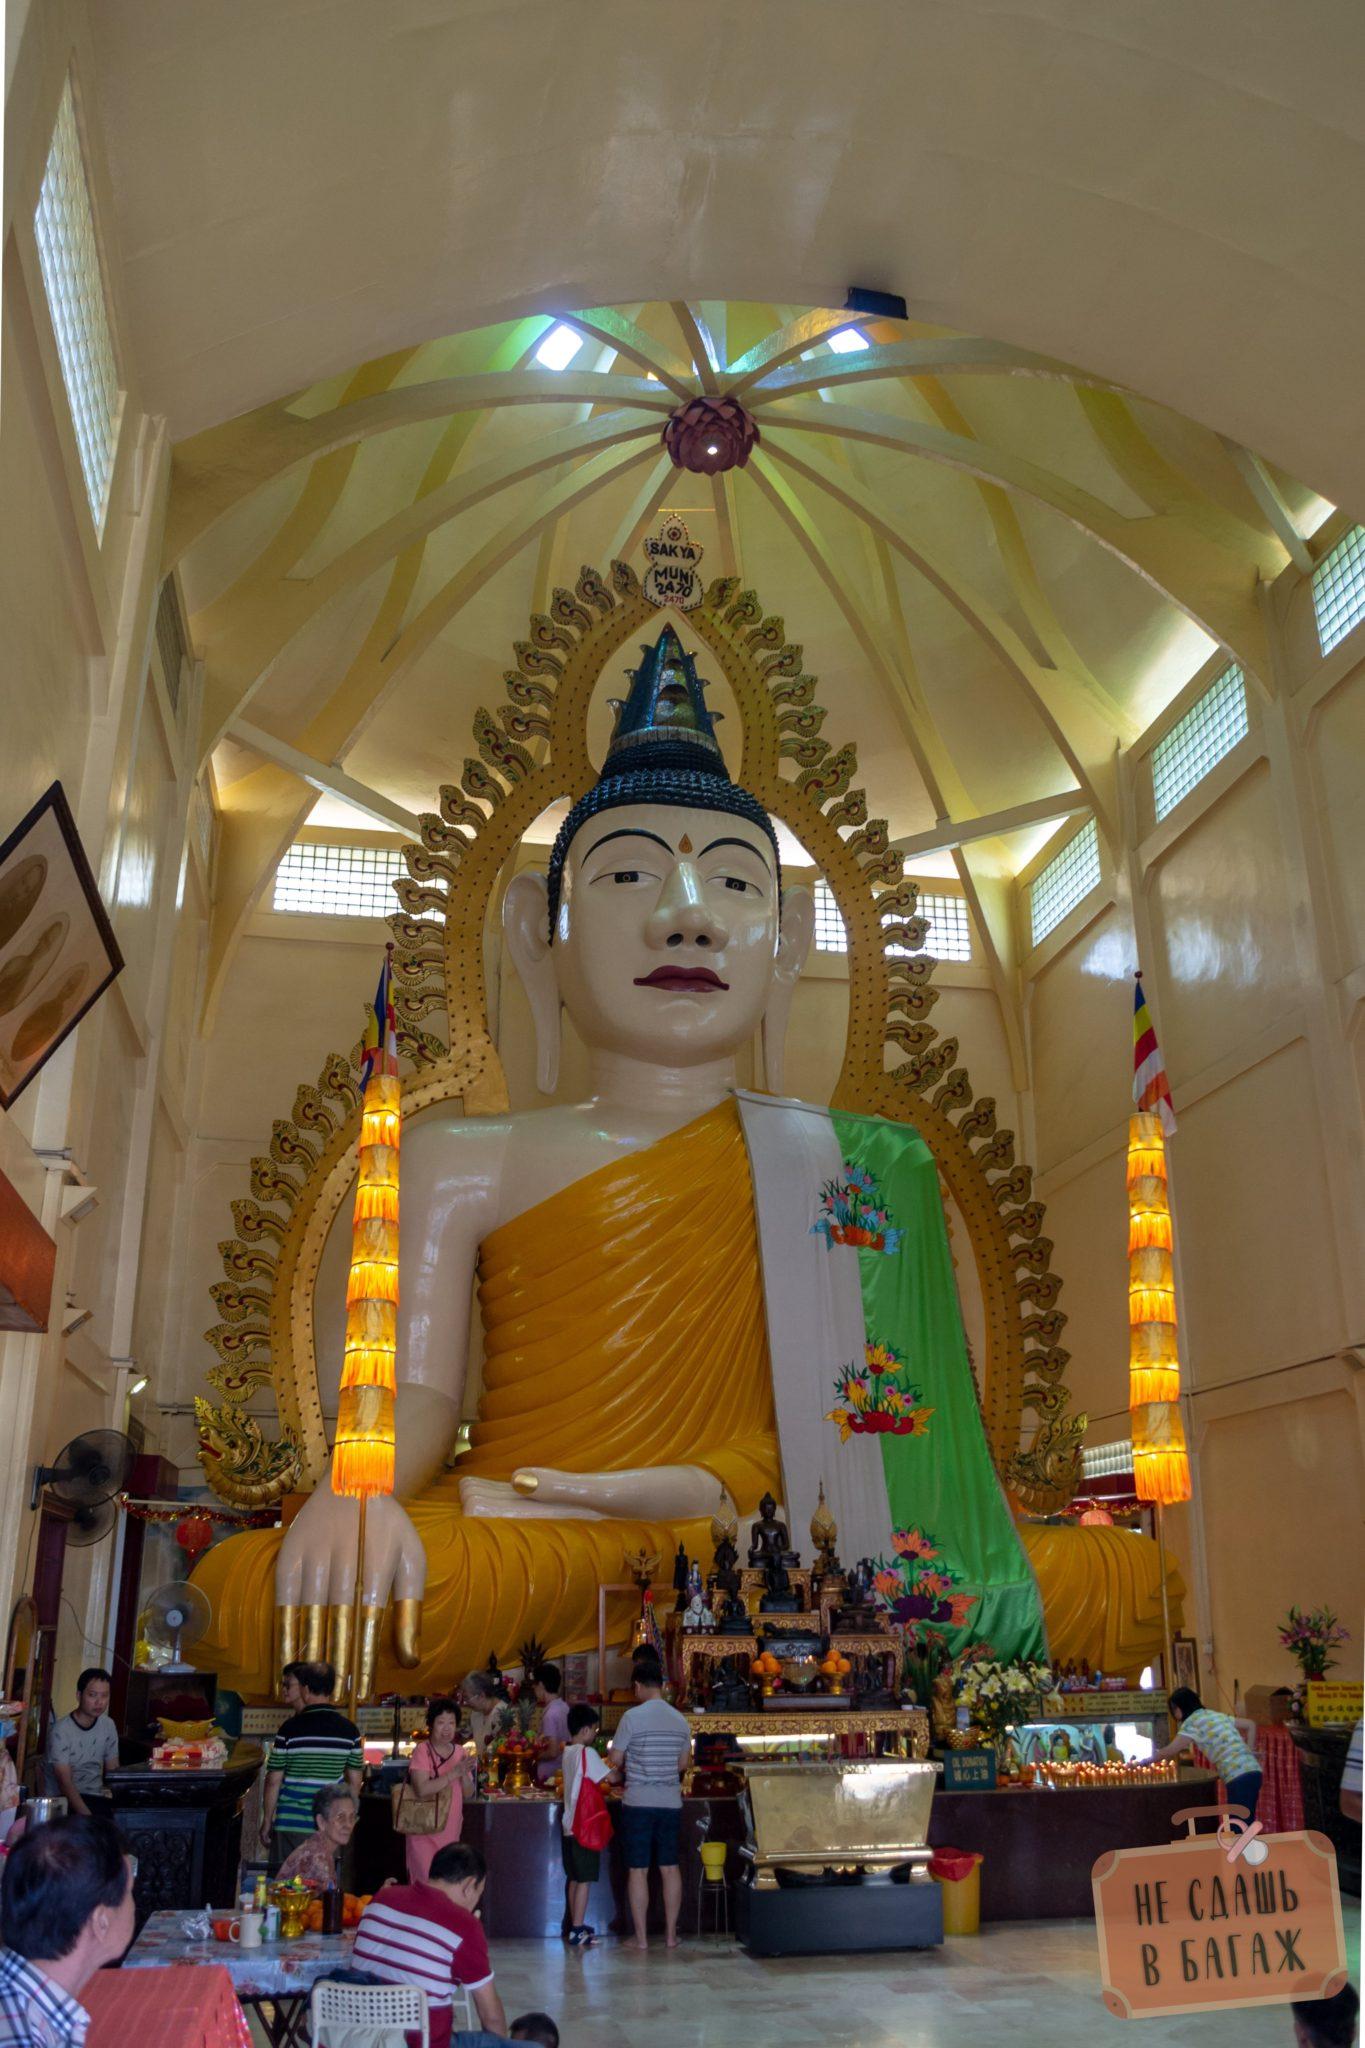 буддийский храм – Sakya Muni Buddha Gaya Temple